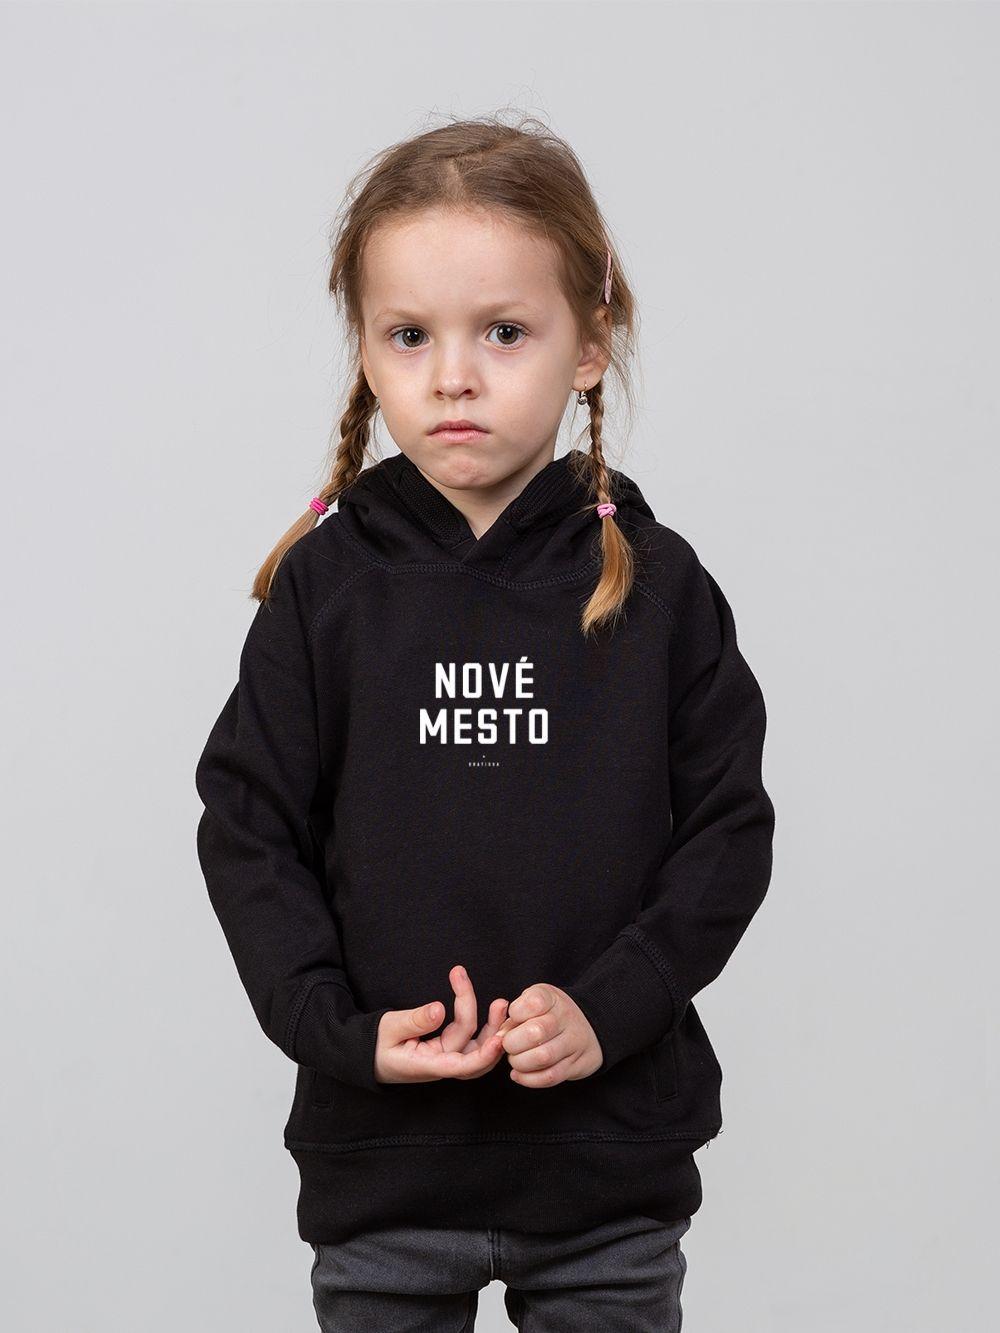 Nové Mesto Kids